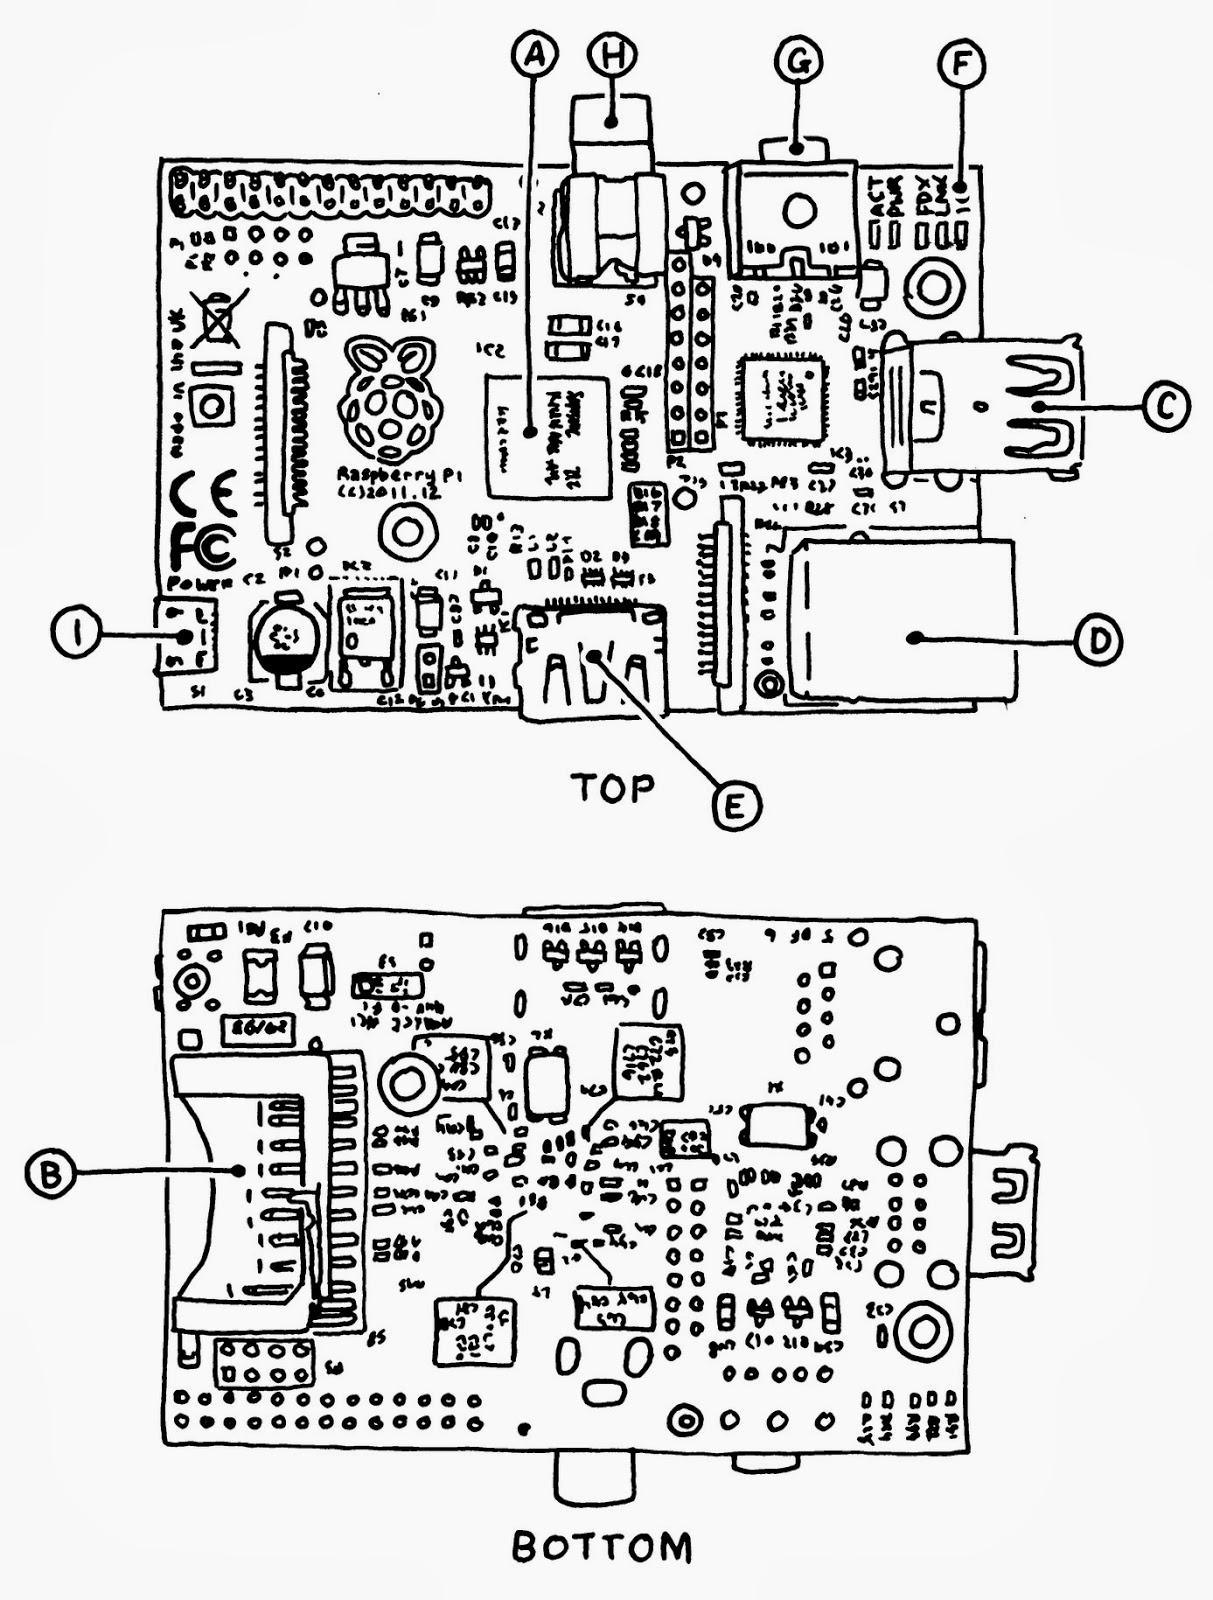 parts of raspberry pi